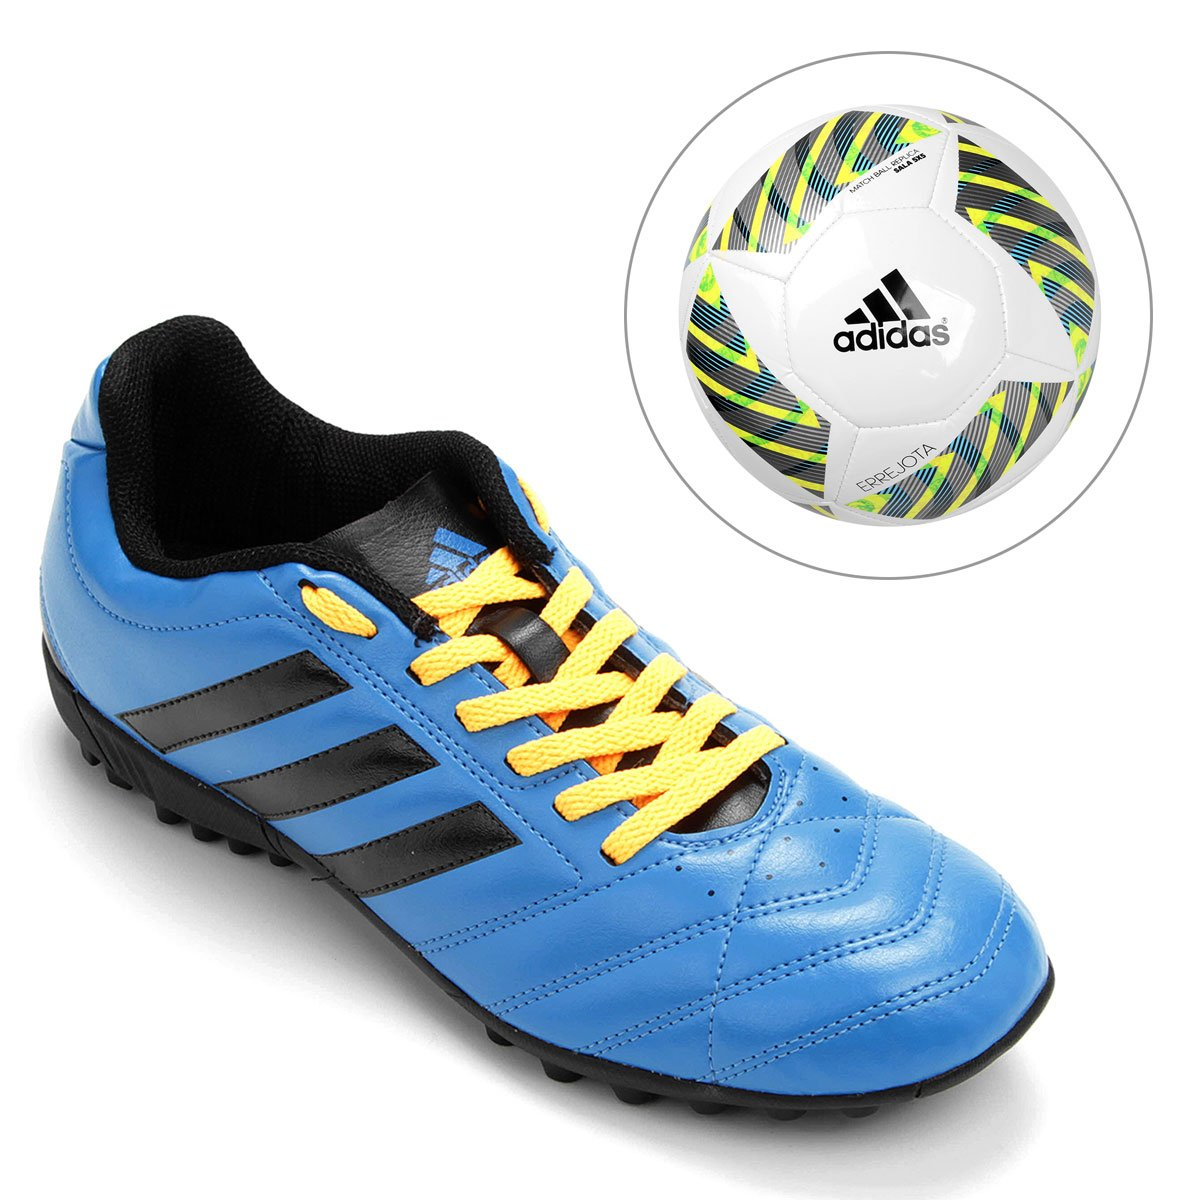 a019b052d ... Chuteira Adidas Goletto 5 TF Society + Bola Adidas Errejota Fifa Sala  5X5 - Compre Agora ...